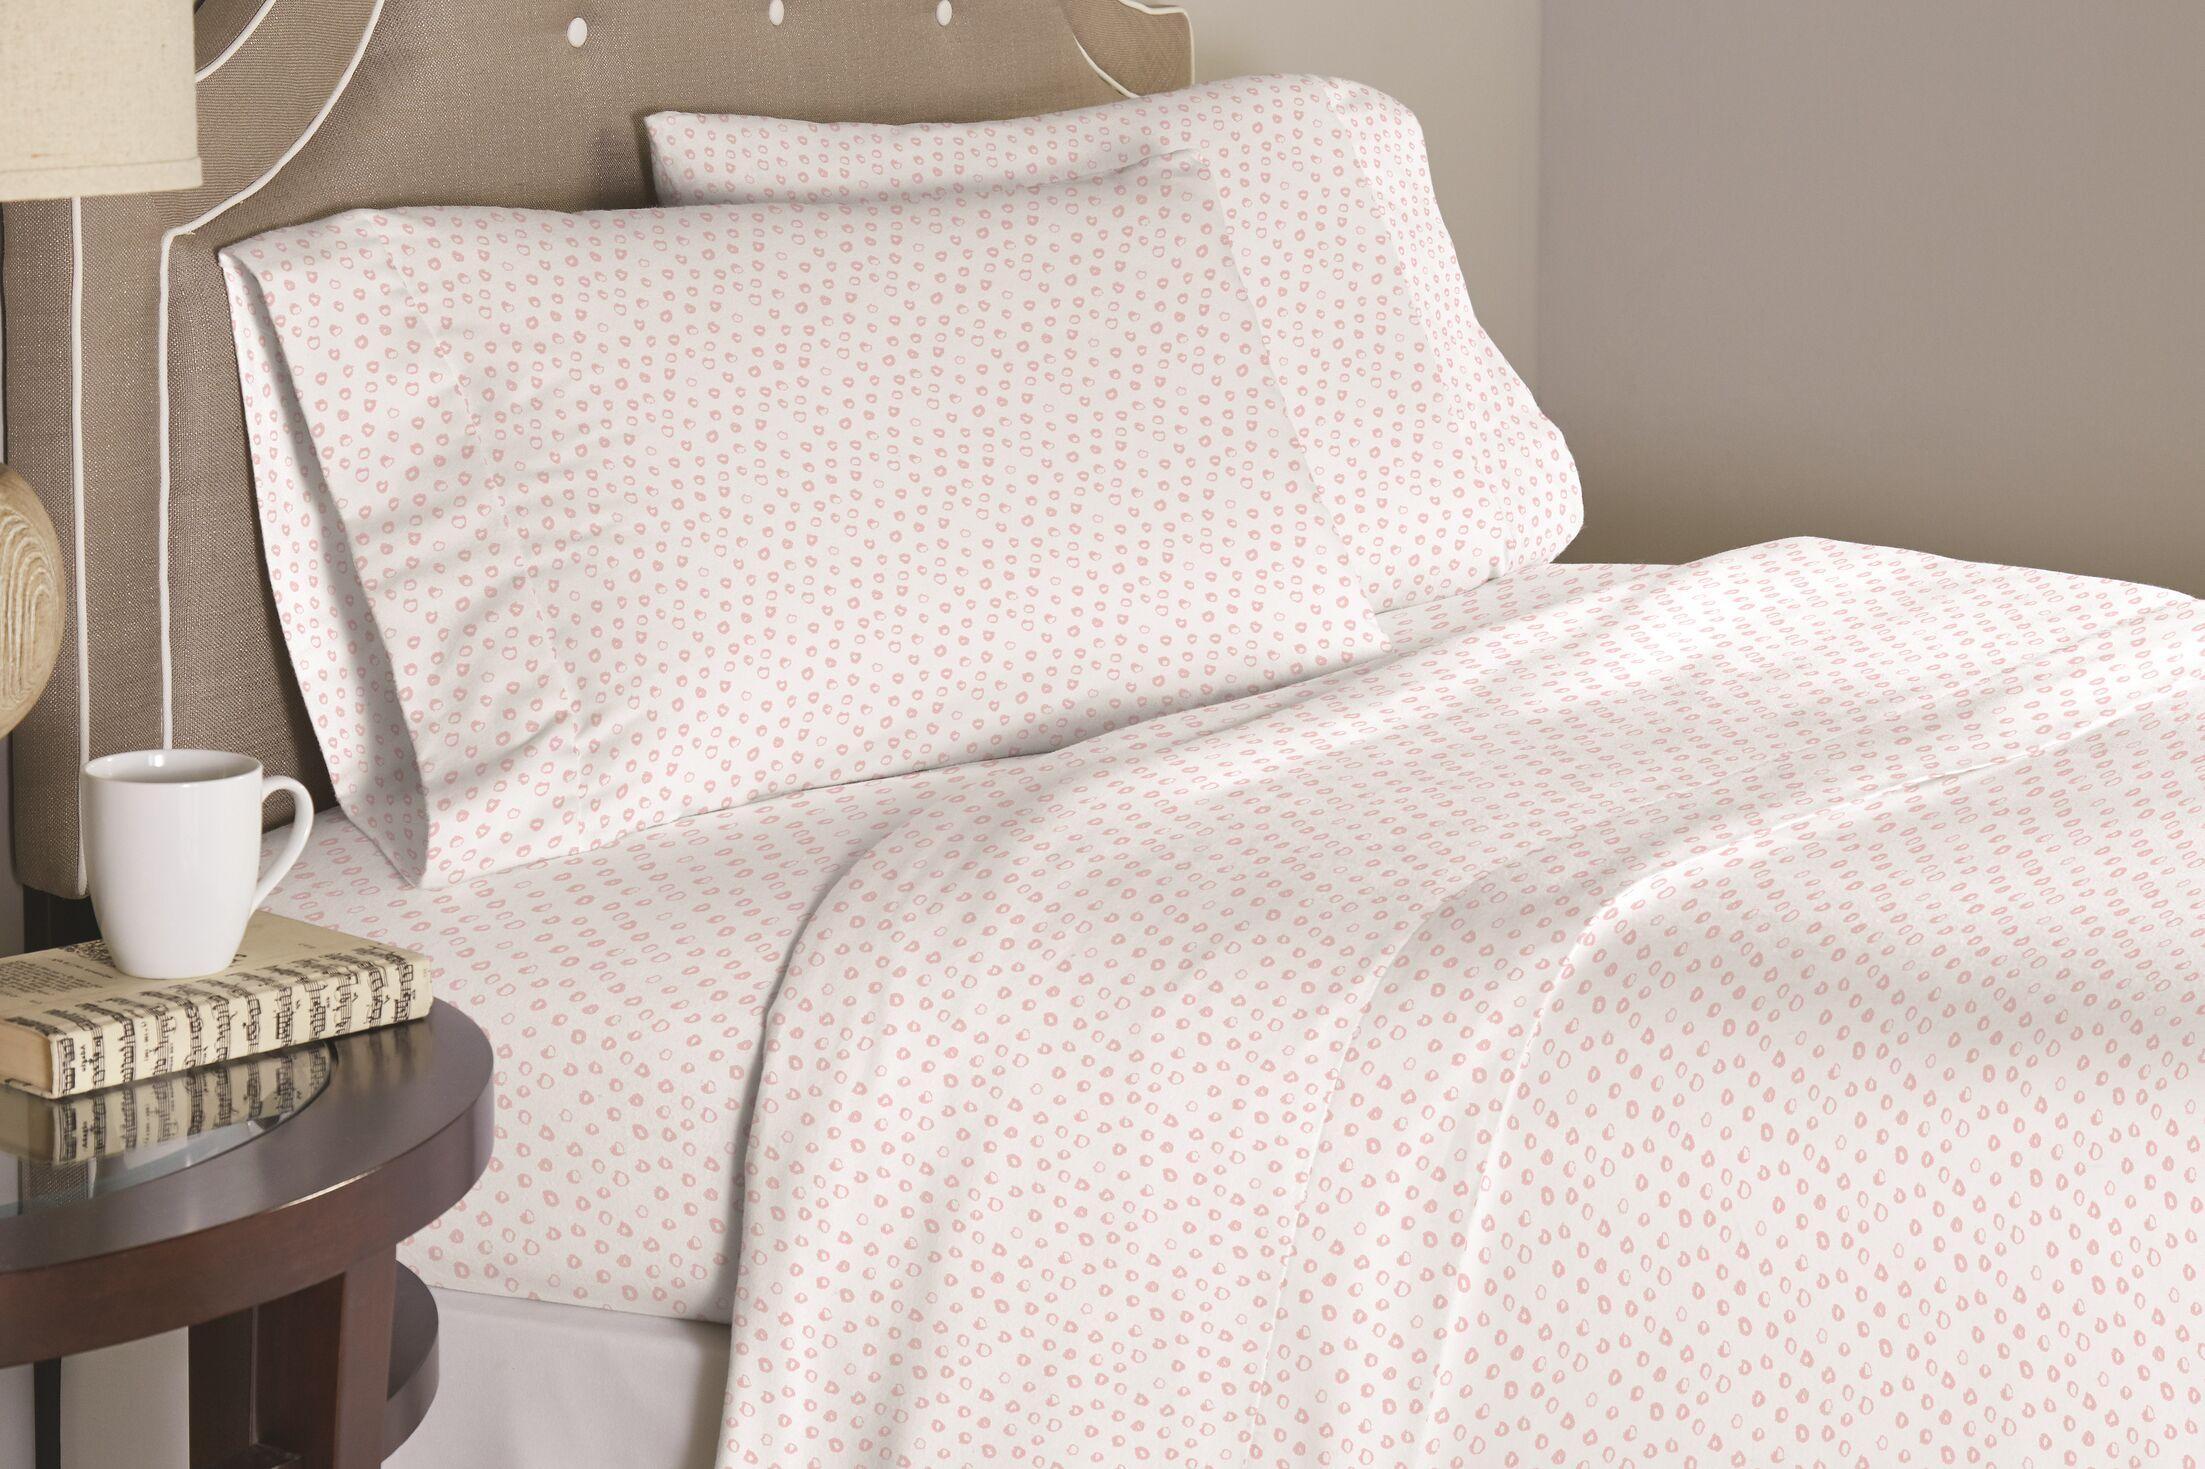 Lightweight Comforter Size: Twin/Twin XL